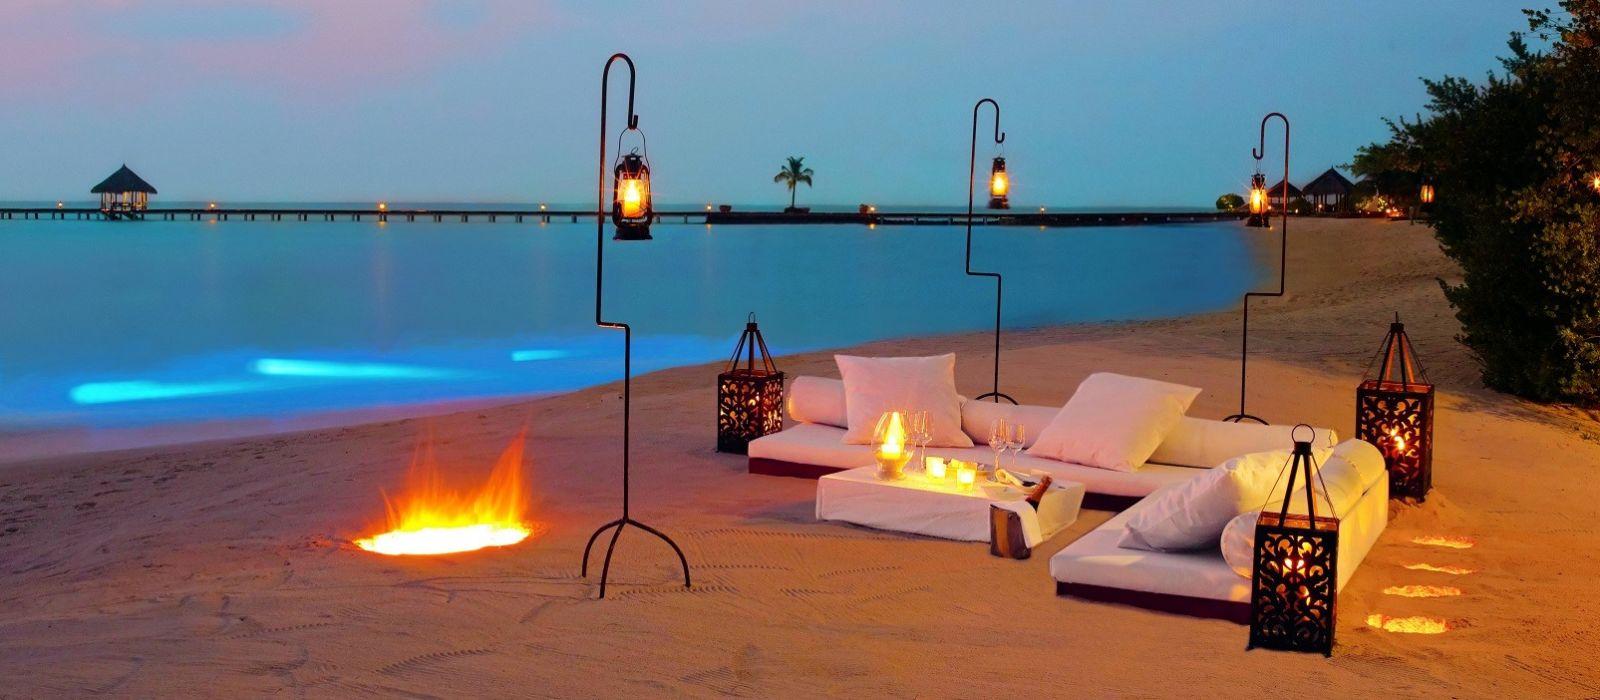 Sri Lankan Heritage and Maldives Luxury Tour Trip 7